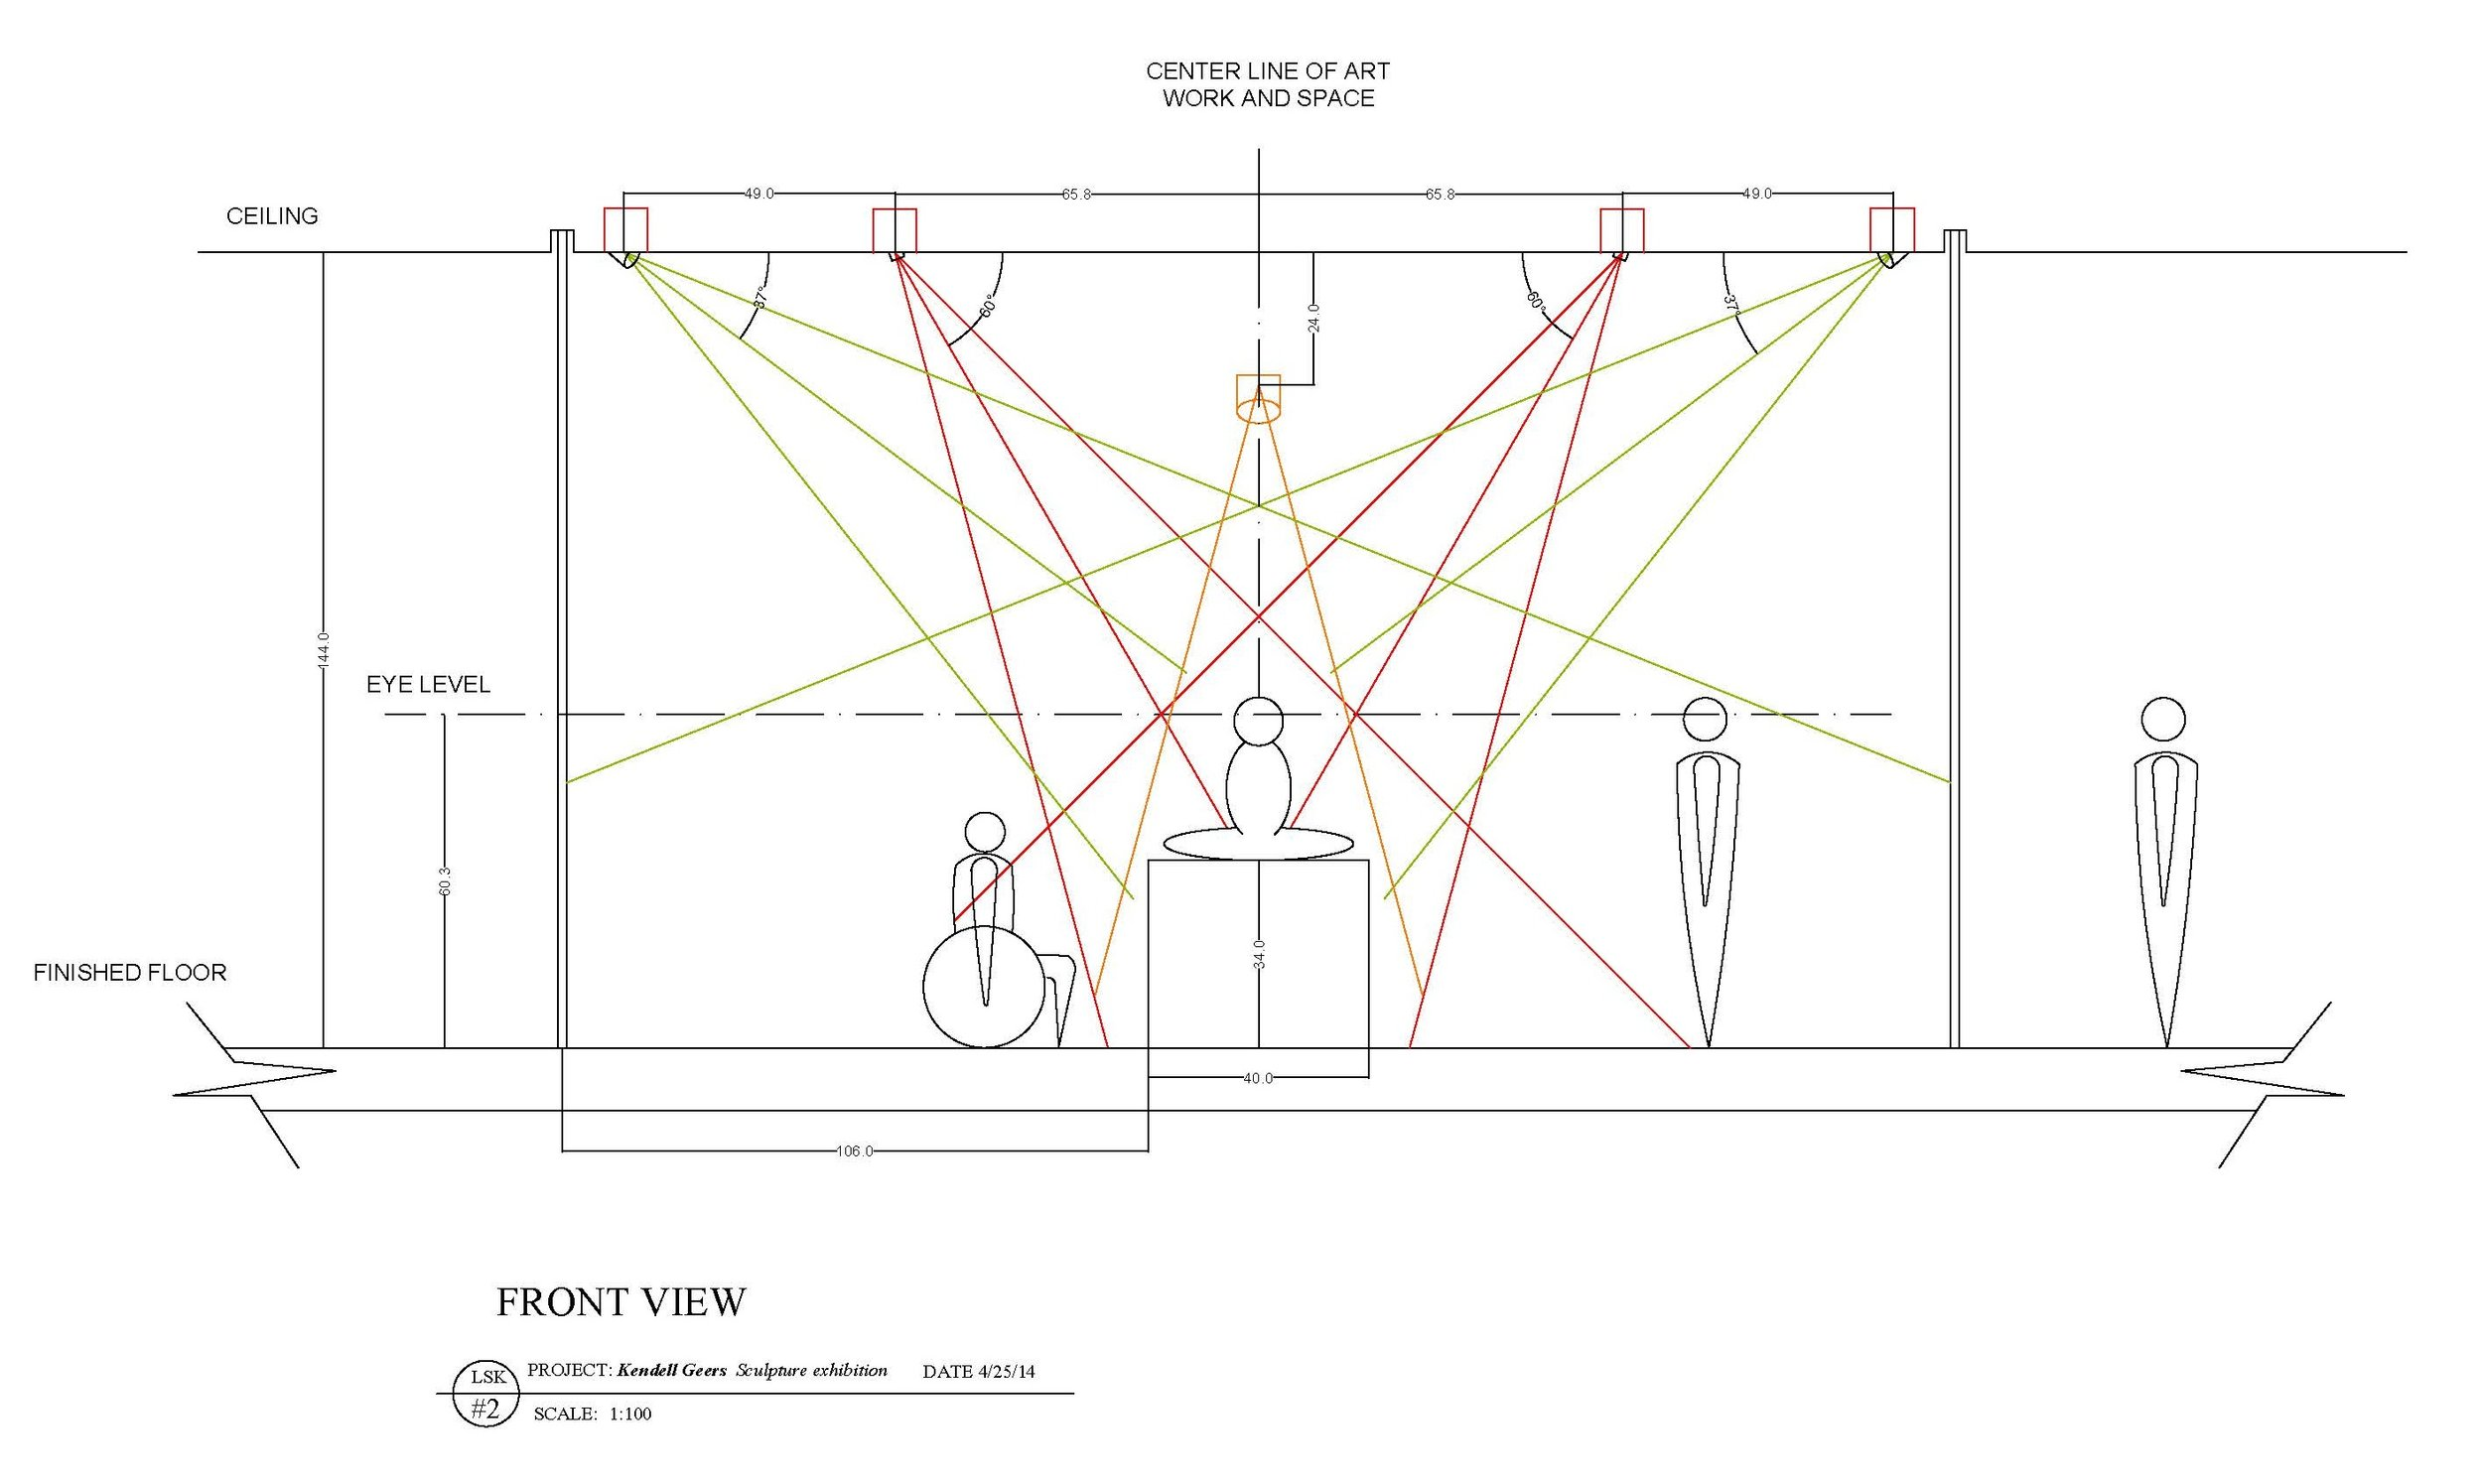 fatemeh-abadian-mps-interior-lighting-design-projects_17644195411_o.jpg